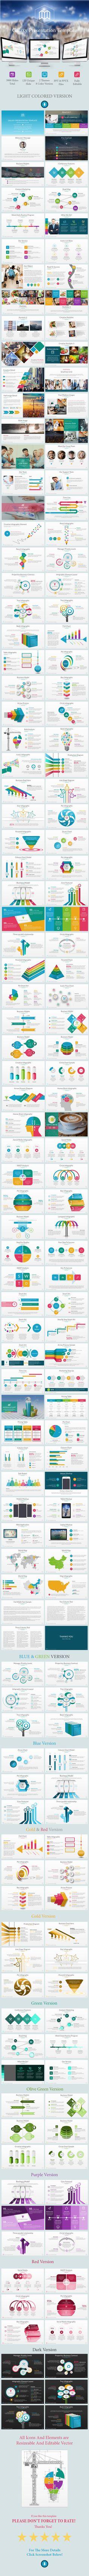 Galaxy PowerPoint Presentation Template | Download: http://graphicriver.net/item/galaxy-presentation-template/11080911?ref=ksioks